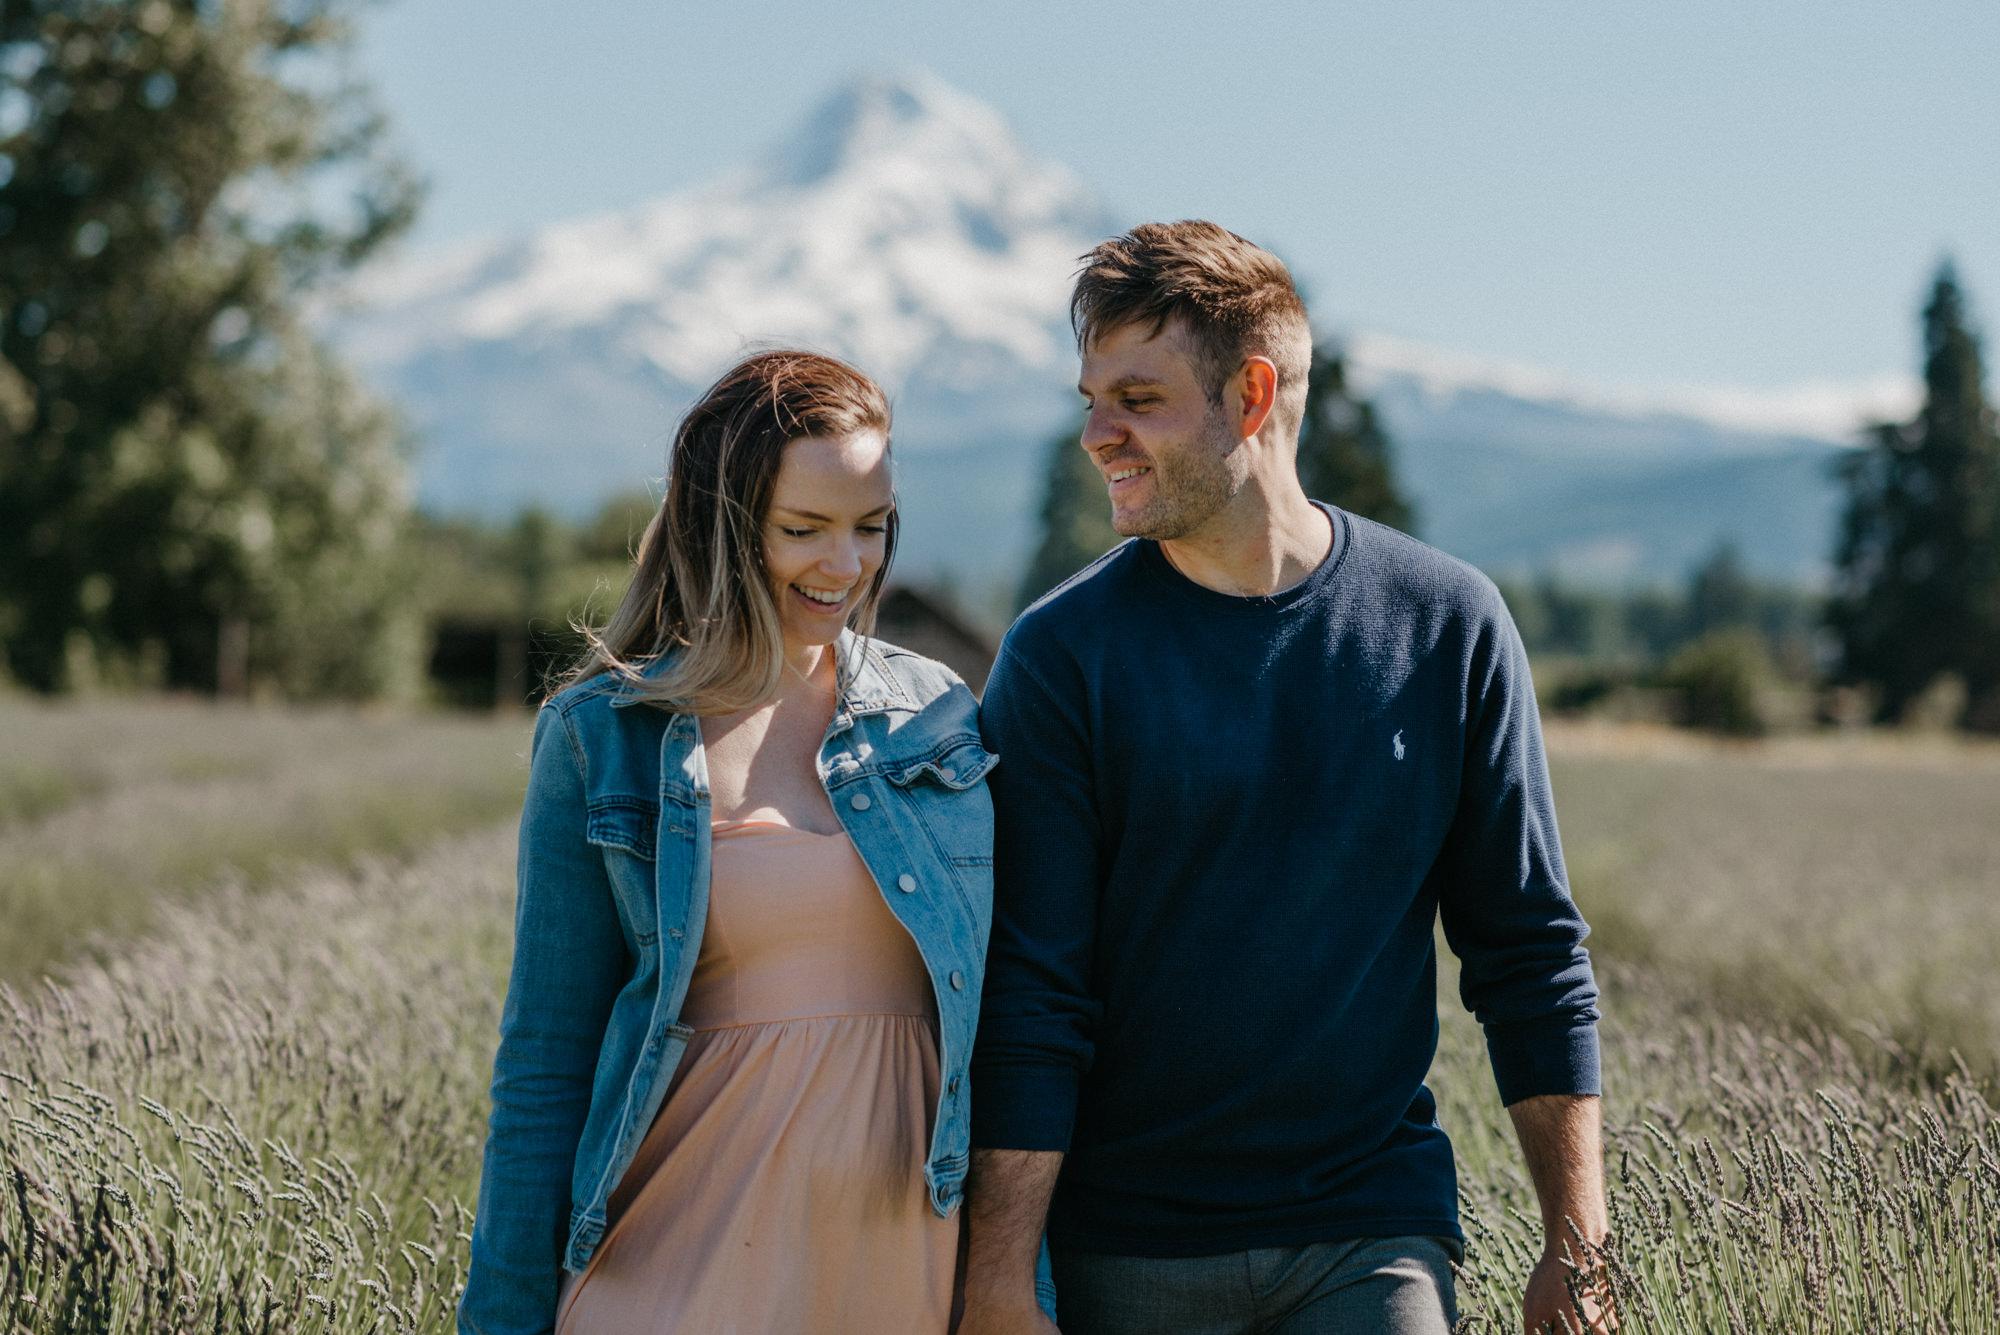 29-Mt-hood-lavender-farms-engagment-couple-summer-7788.jpg